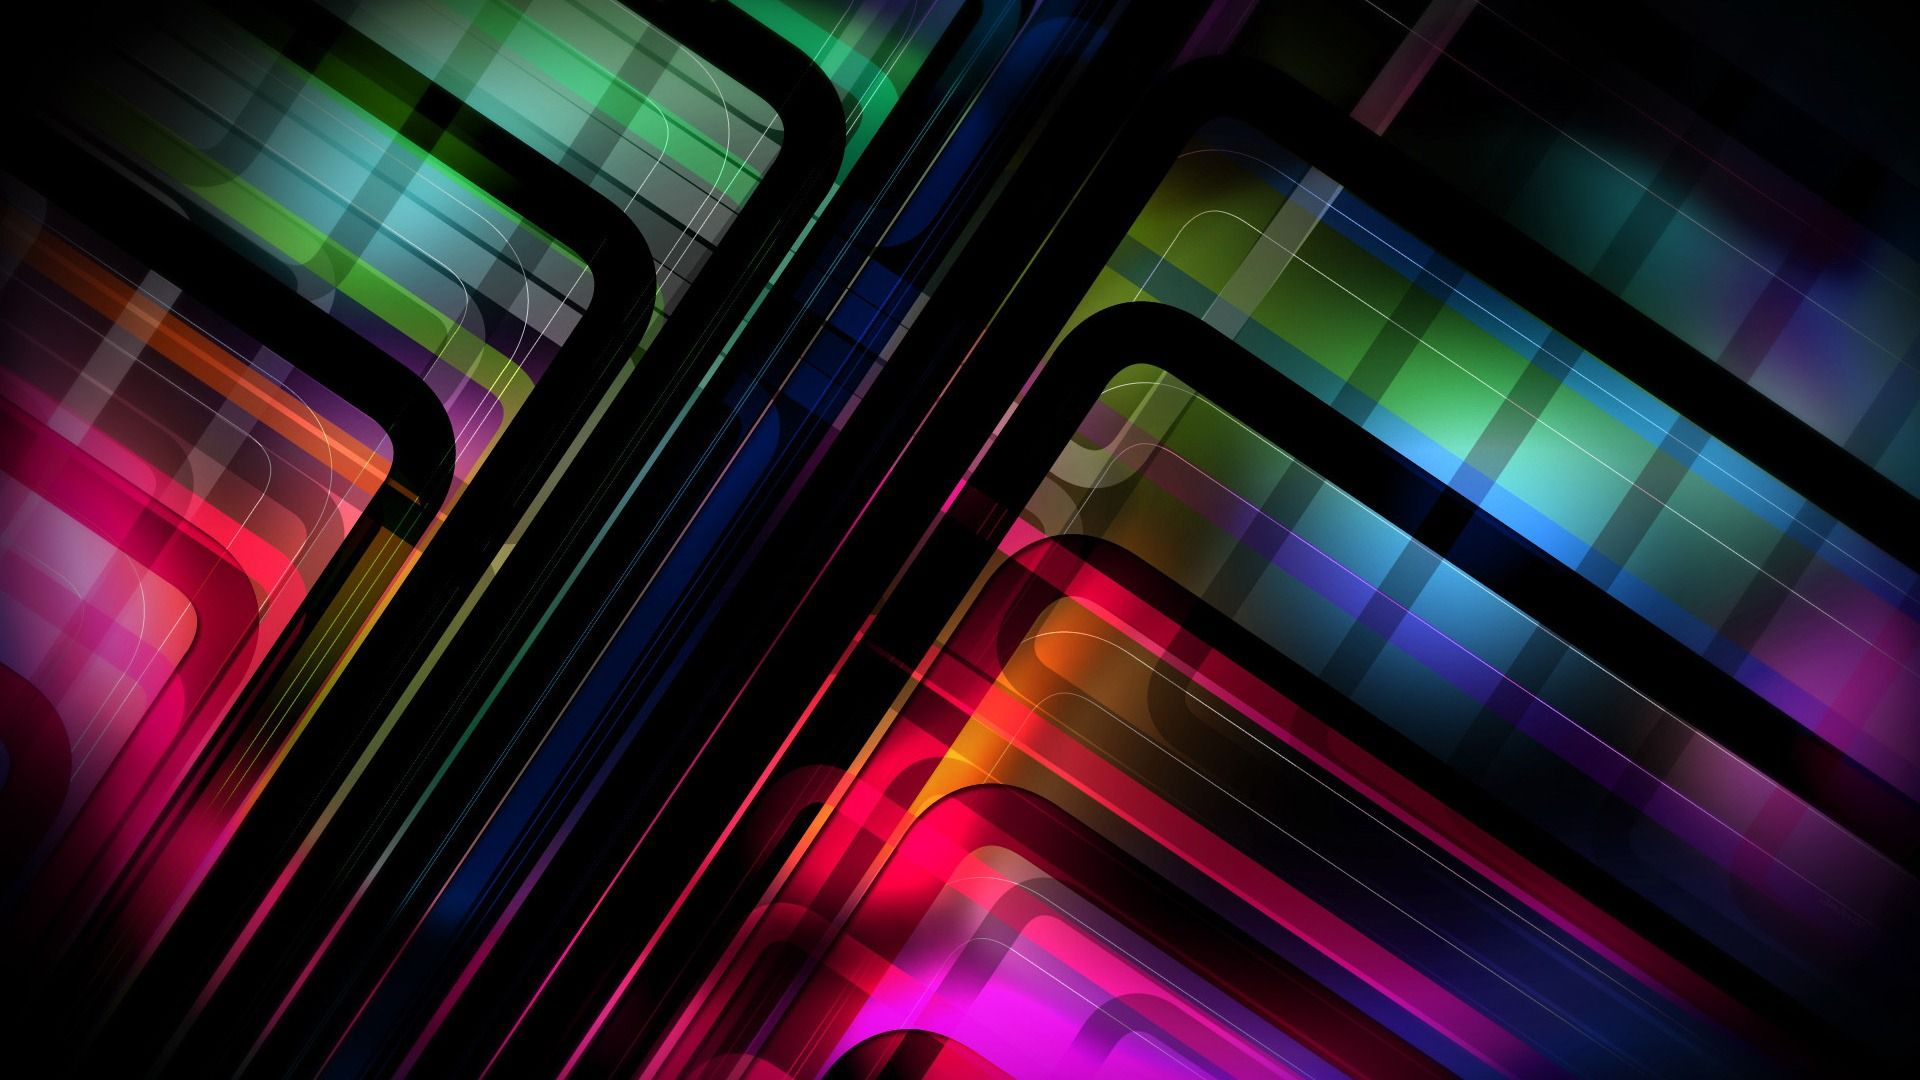 The Best Fullcolor Abstract Free Hd WallpapersBest Backgrounds WallpapersLaptop